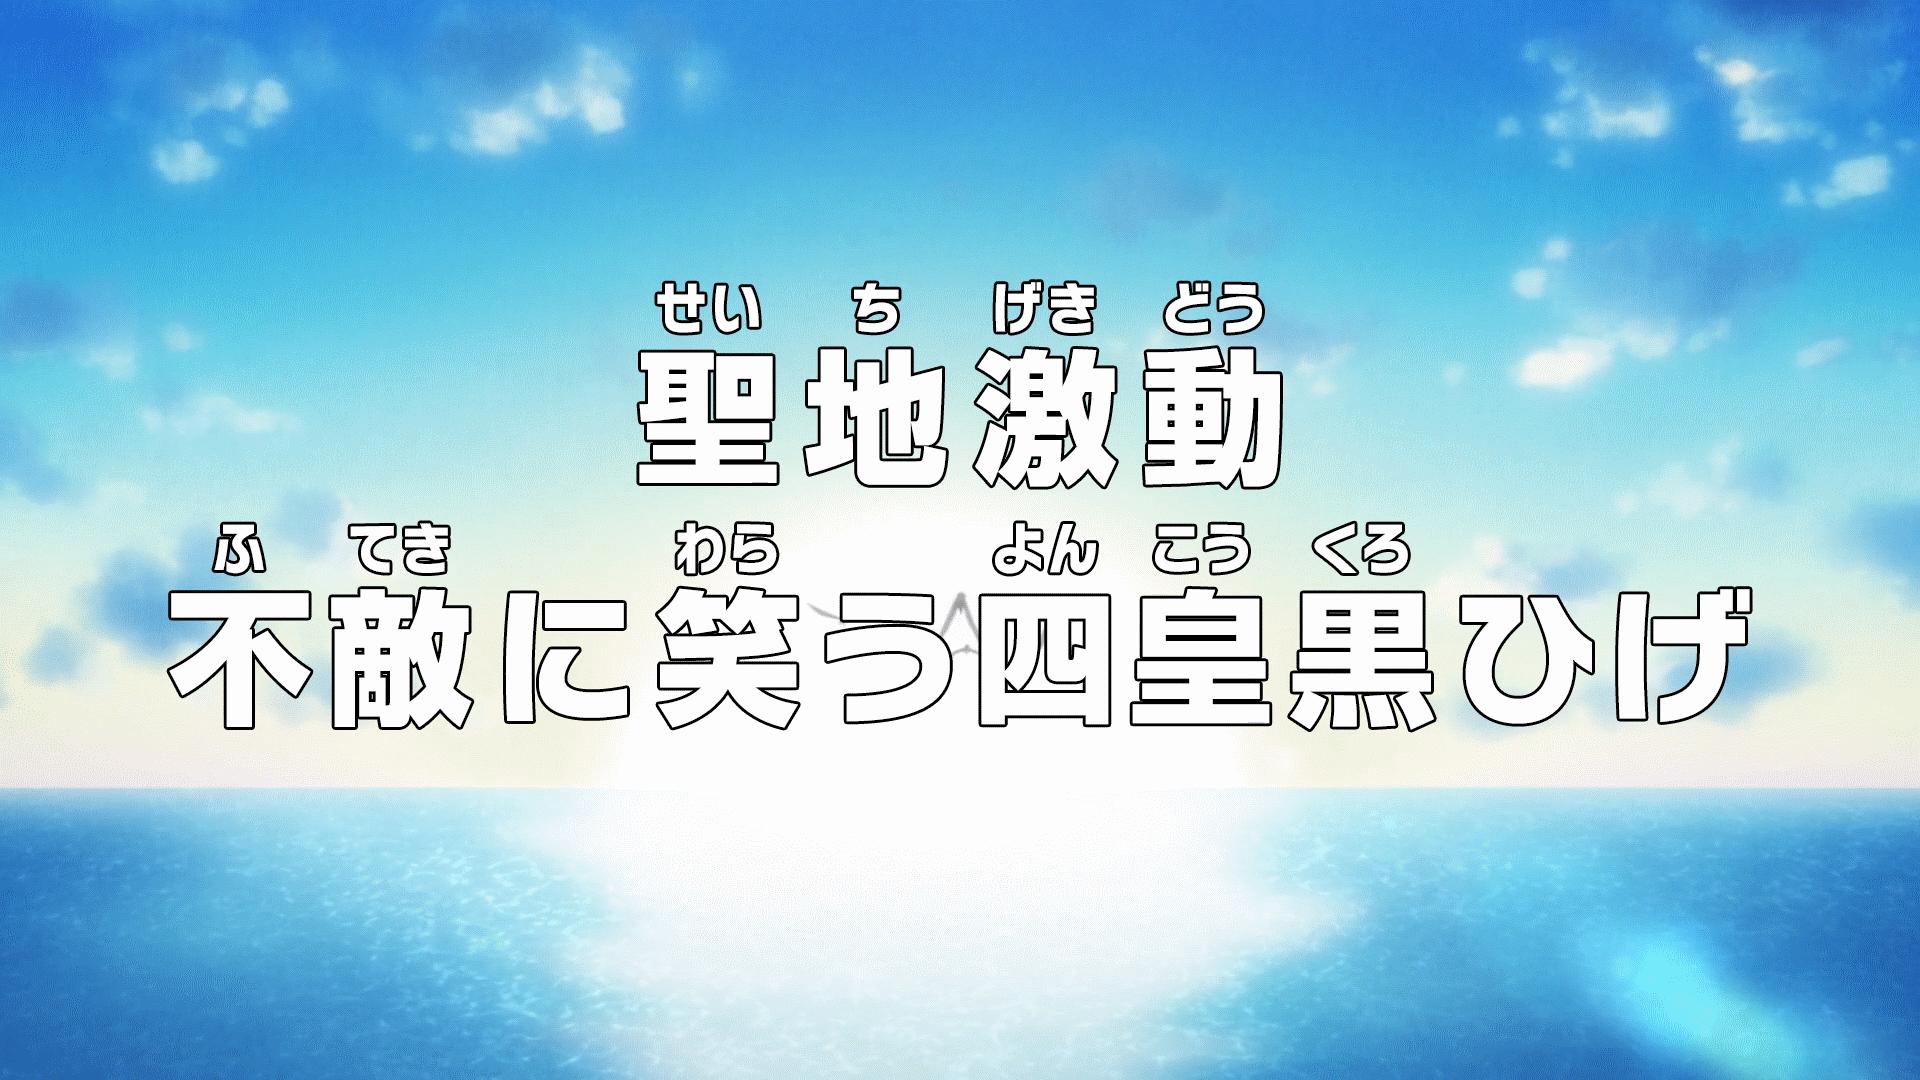 Episode 917